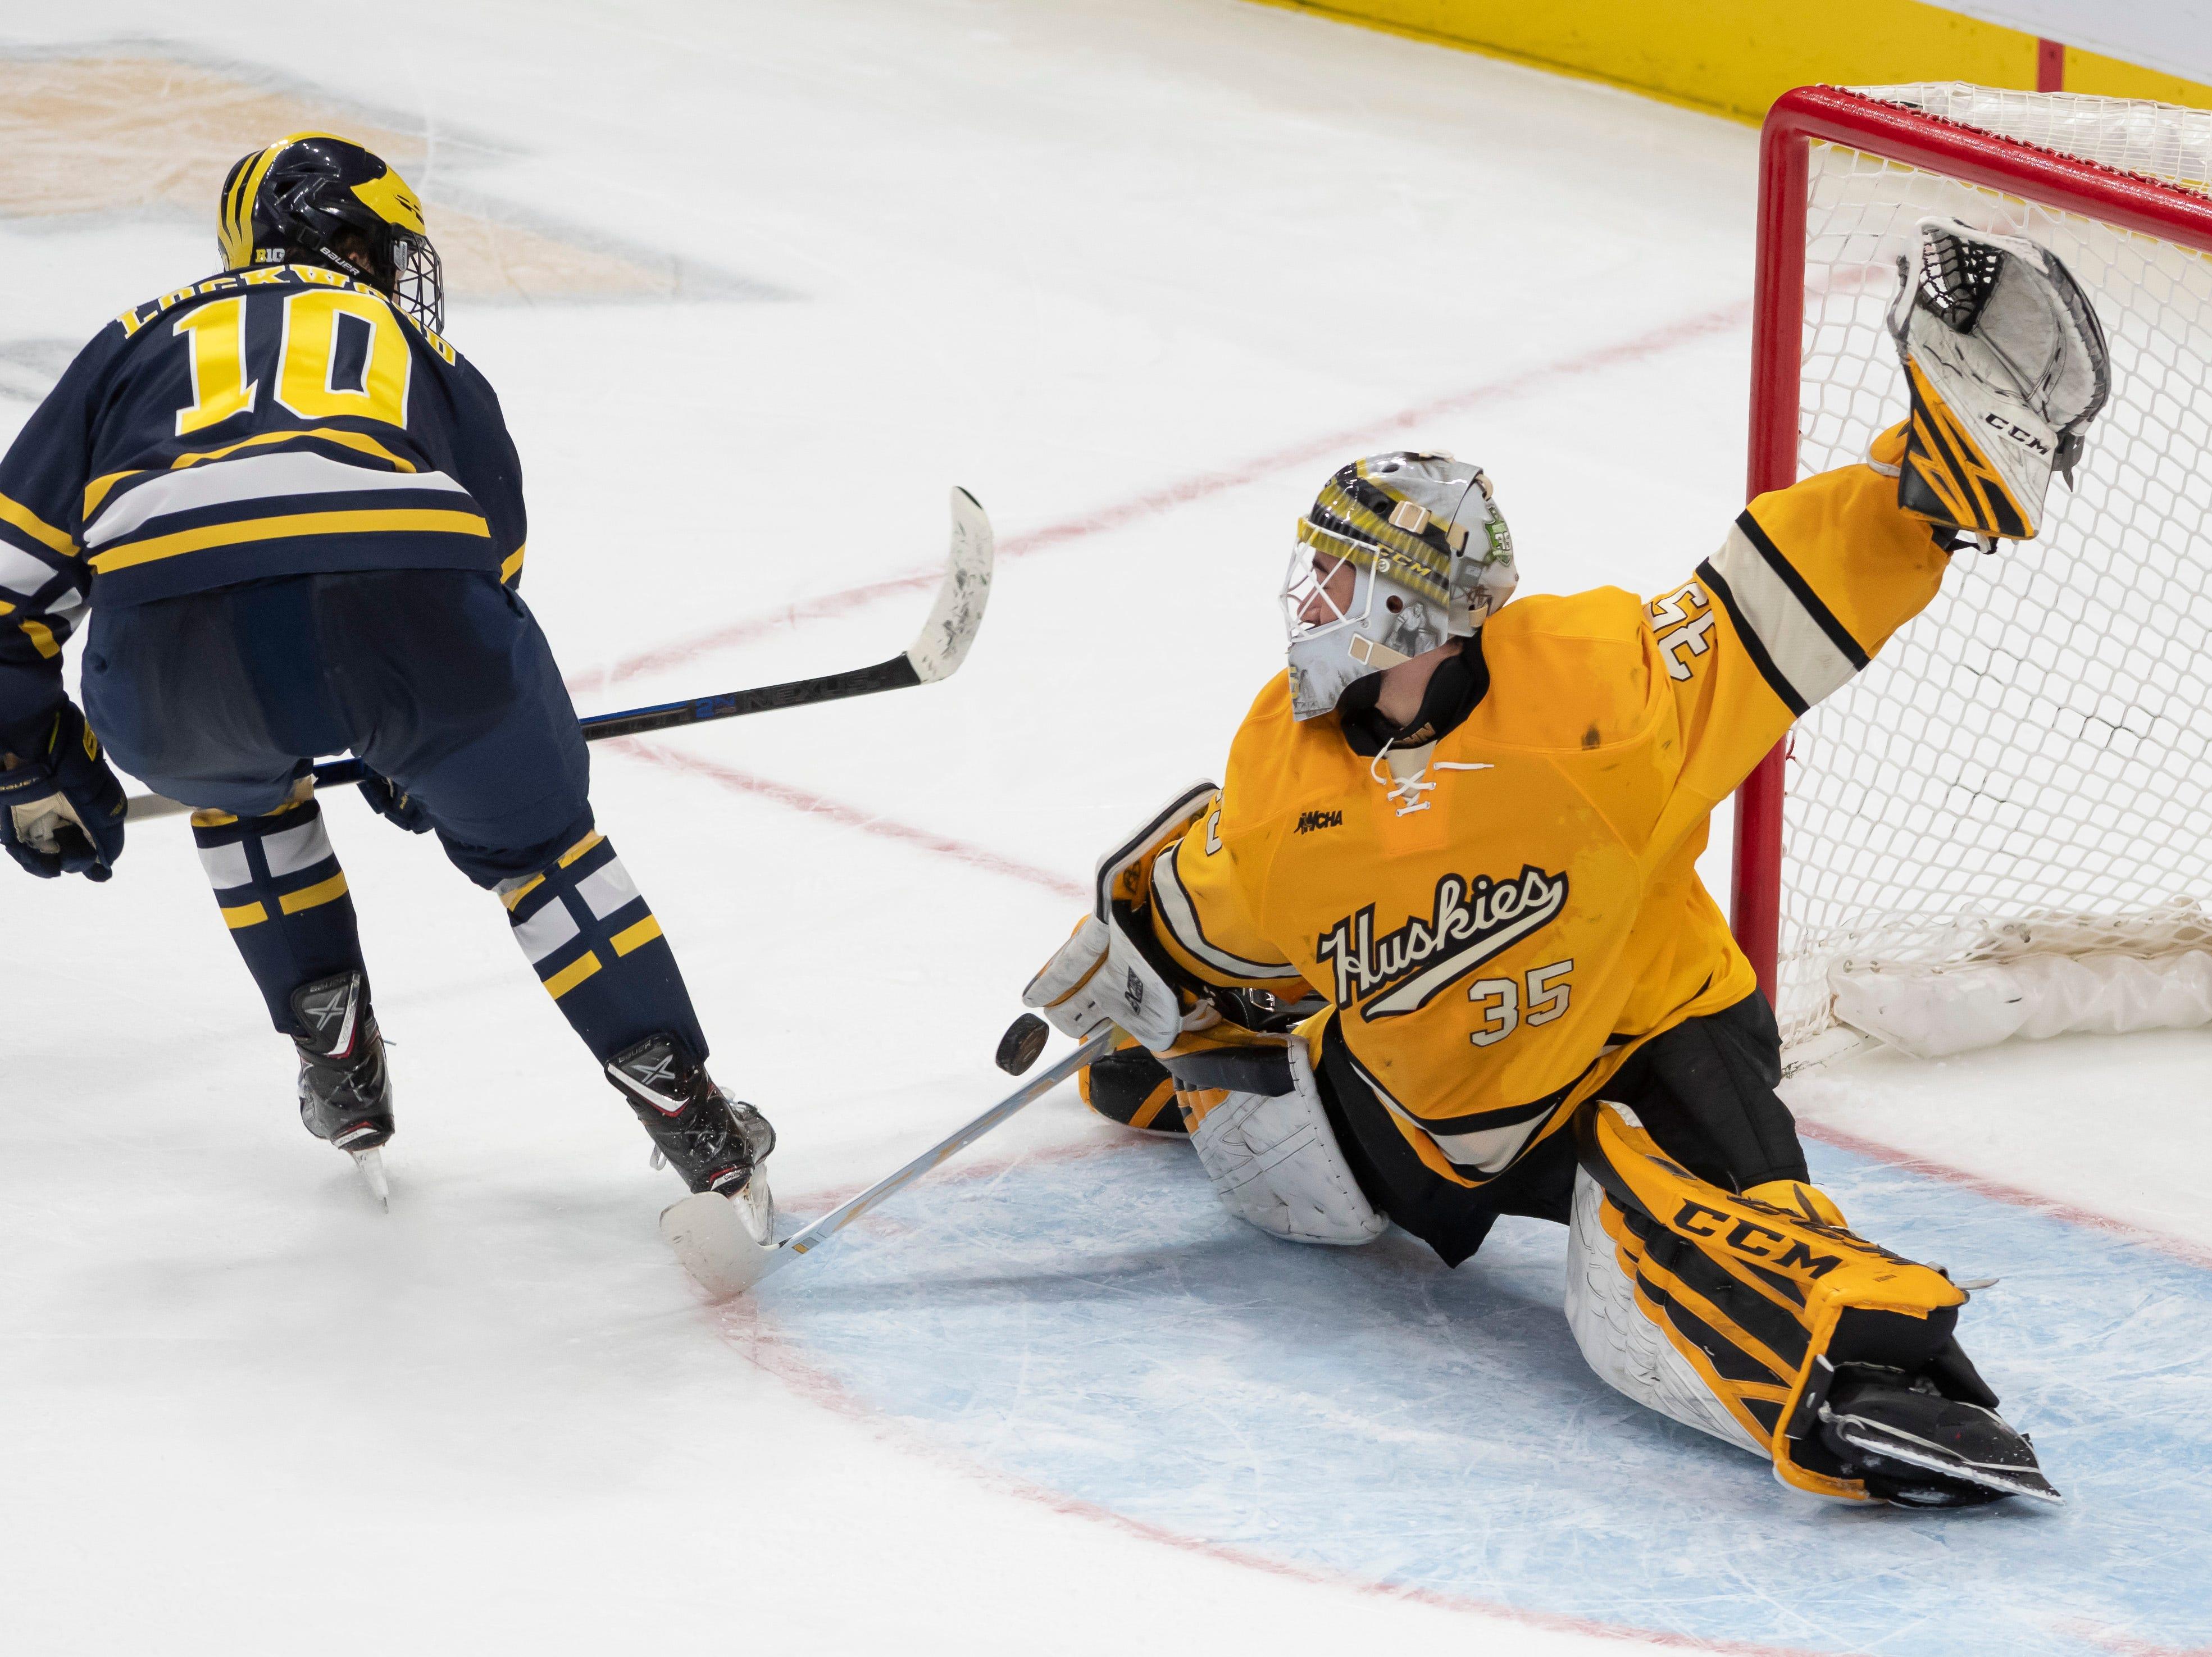 Michigan forward Will Lockwood fails to score on Michigan Tech goaltender Robbie Beydoun during a breakaway in the third period.